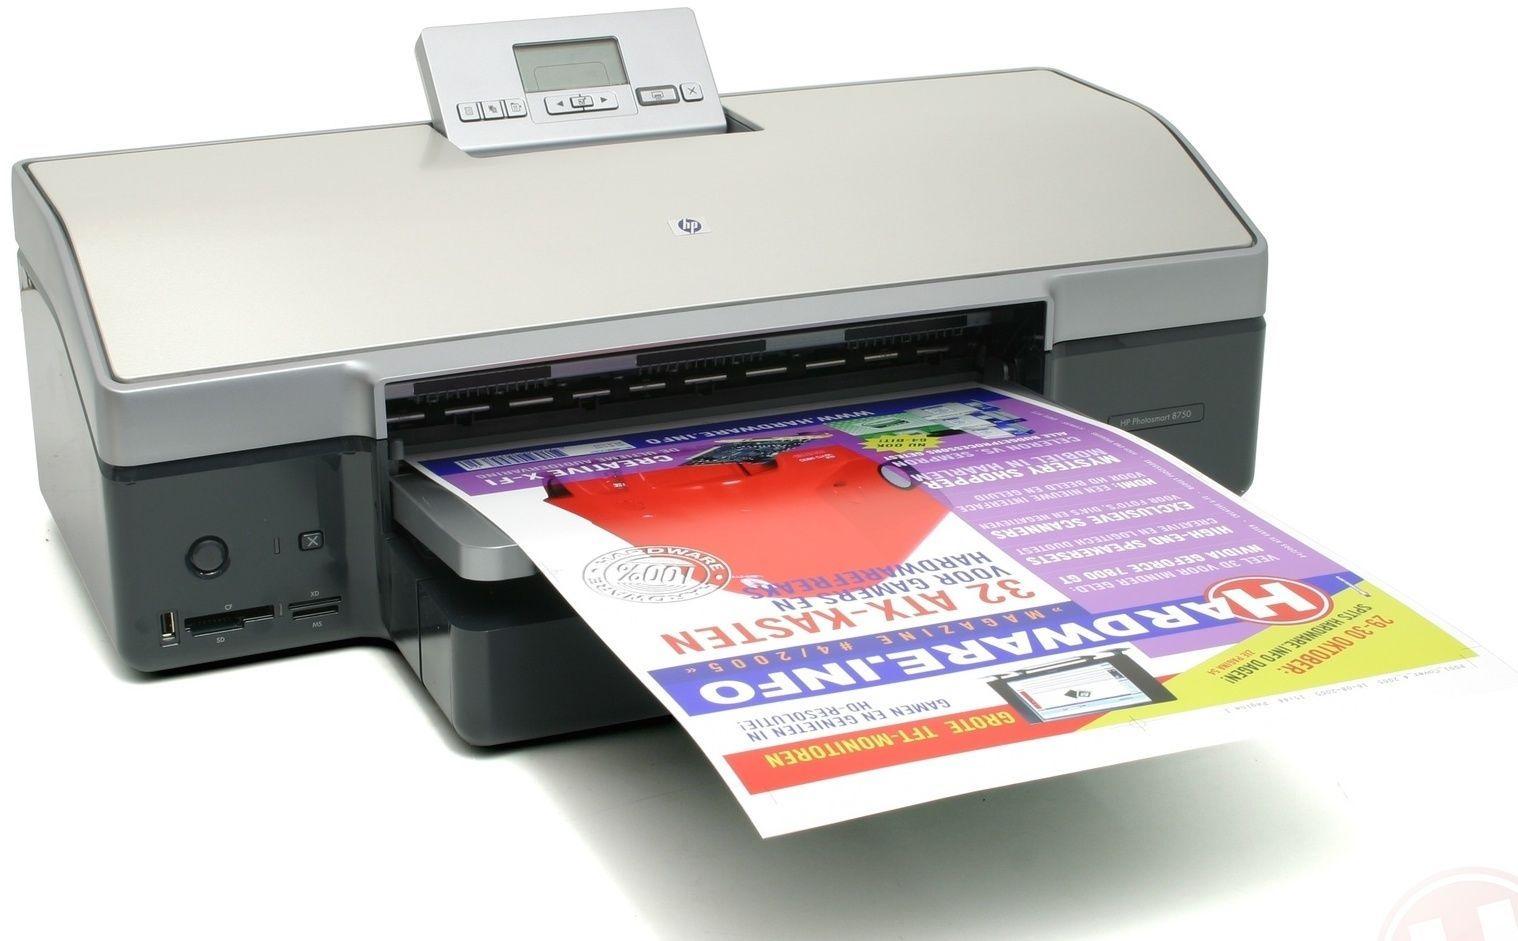 Hp Photosmart 8750 Professional wide format color printer (Q5747A)